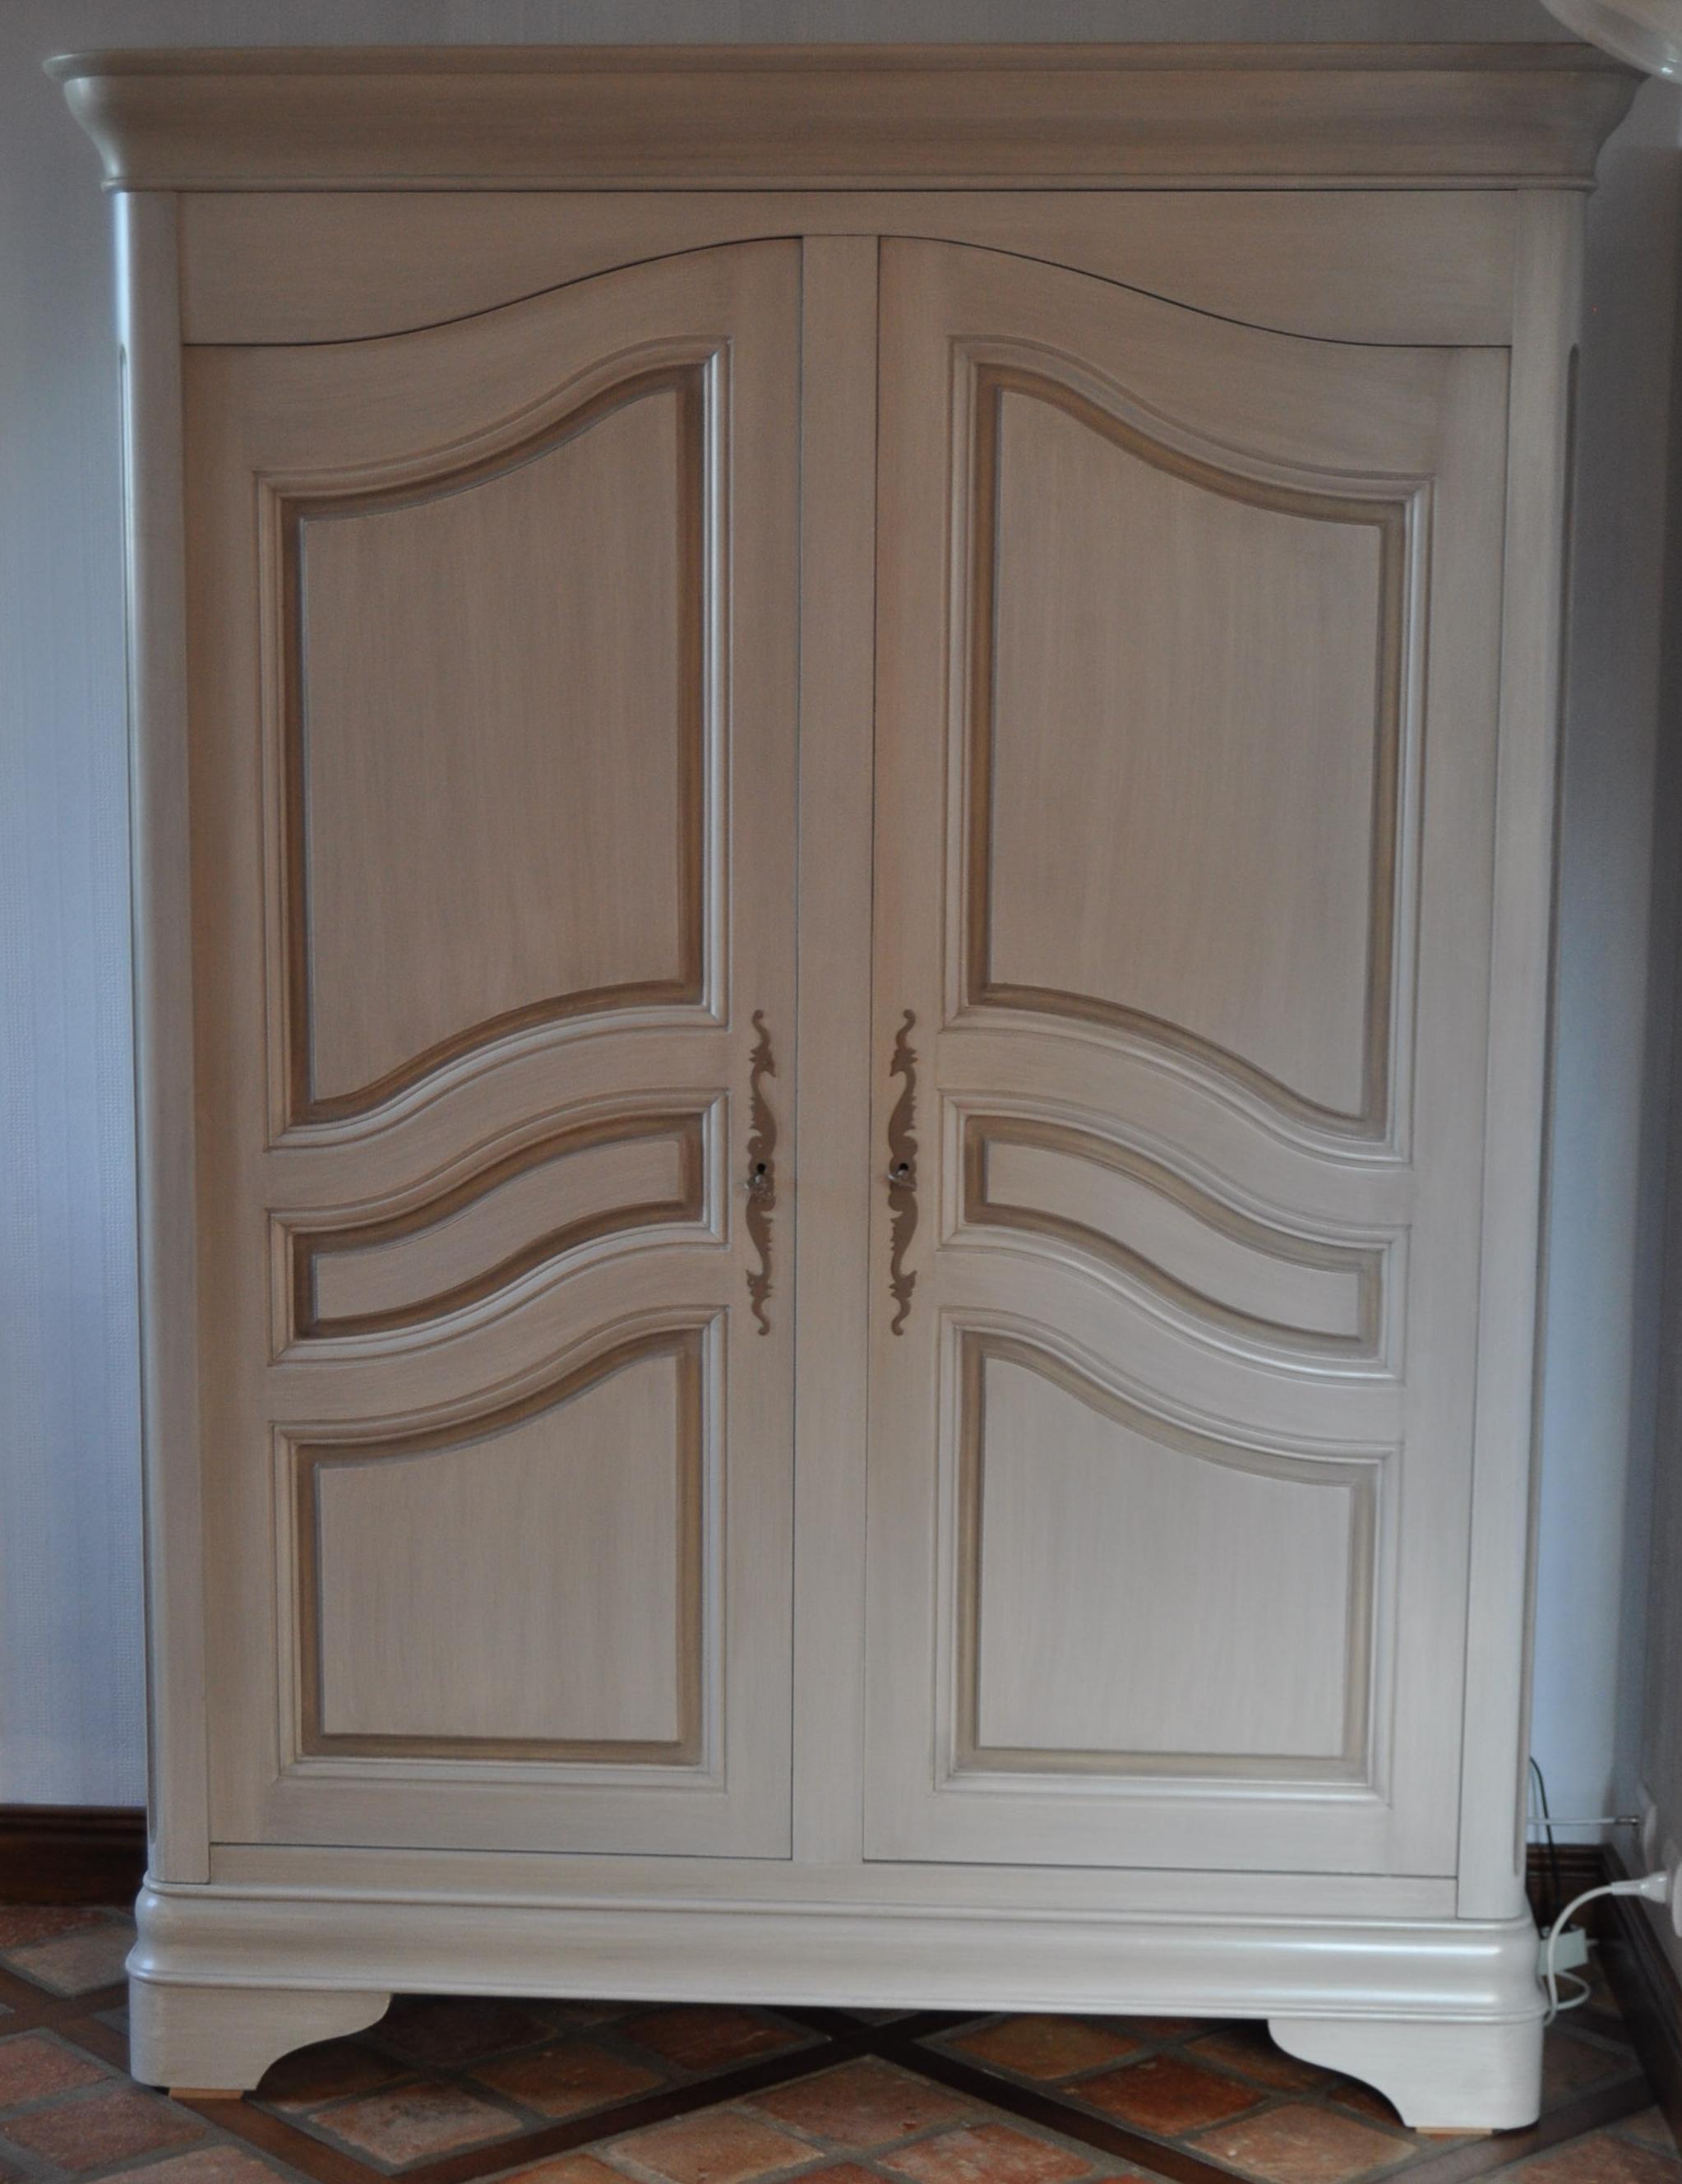 armoire patin e lin et beige taup. Black Bedroom Furniture Sets. Home Design Ideas